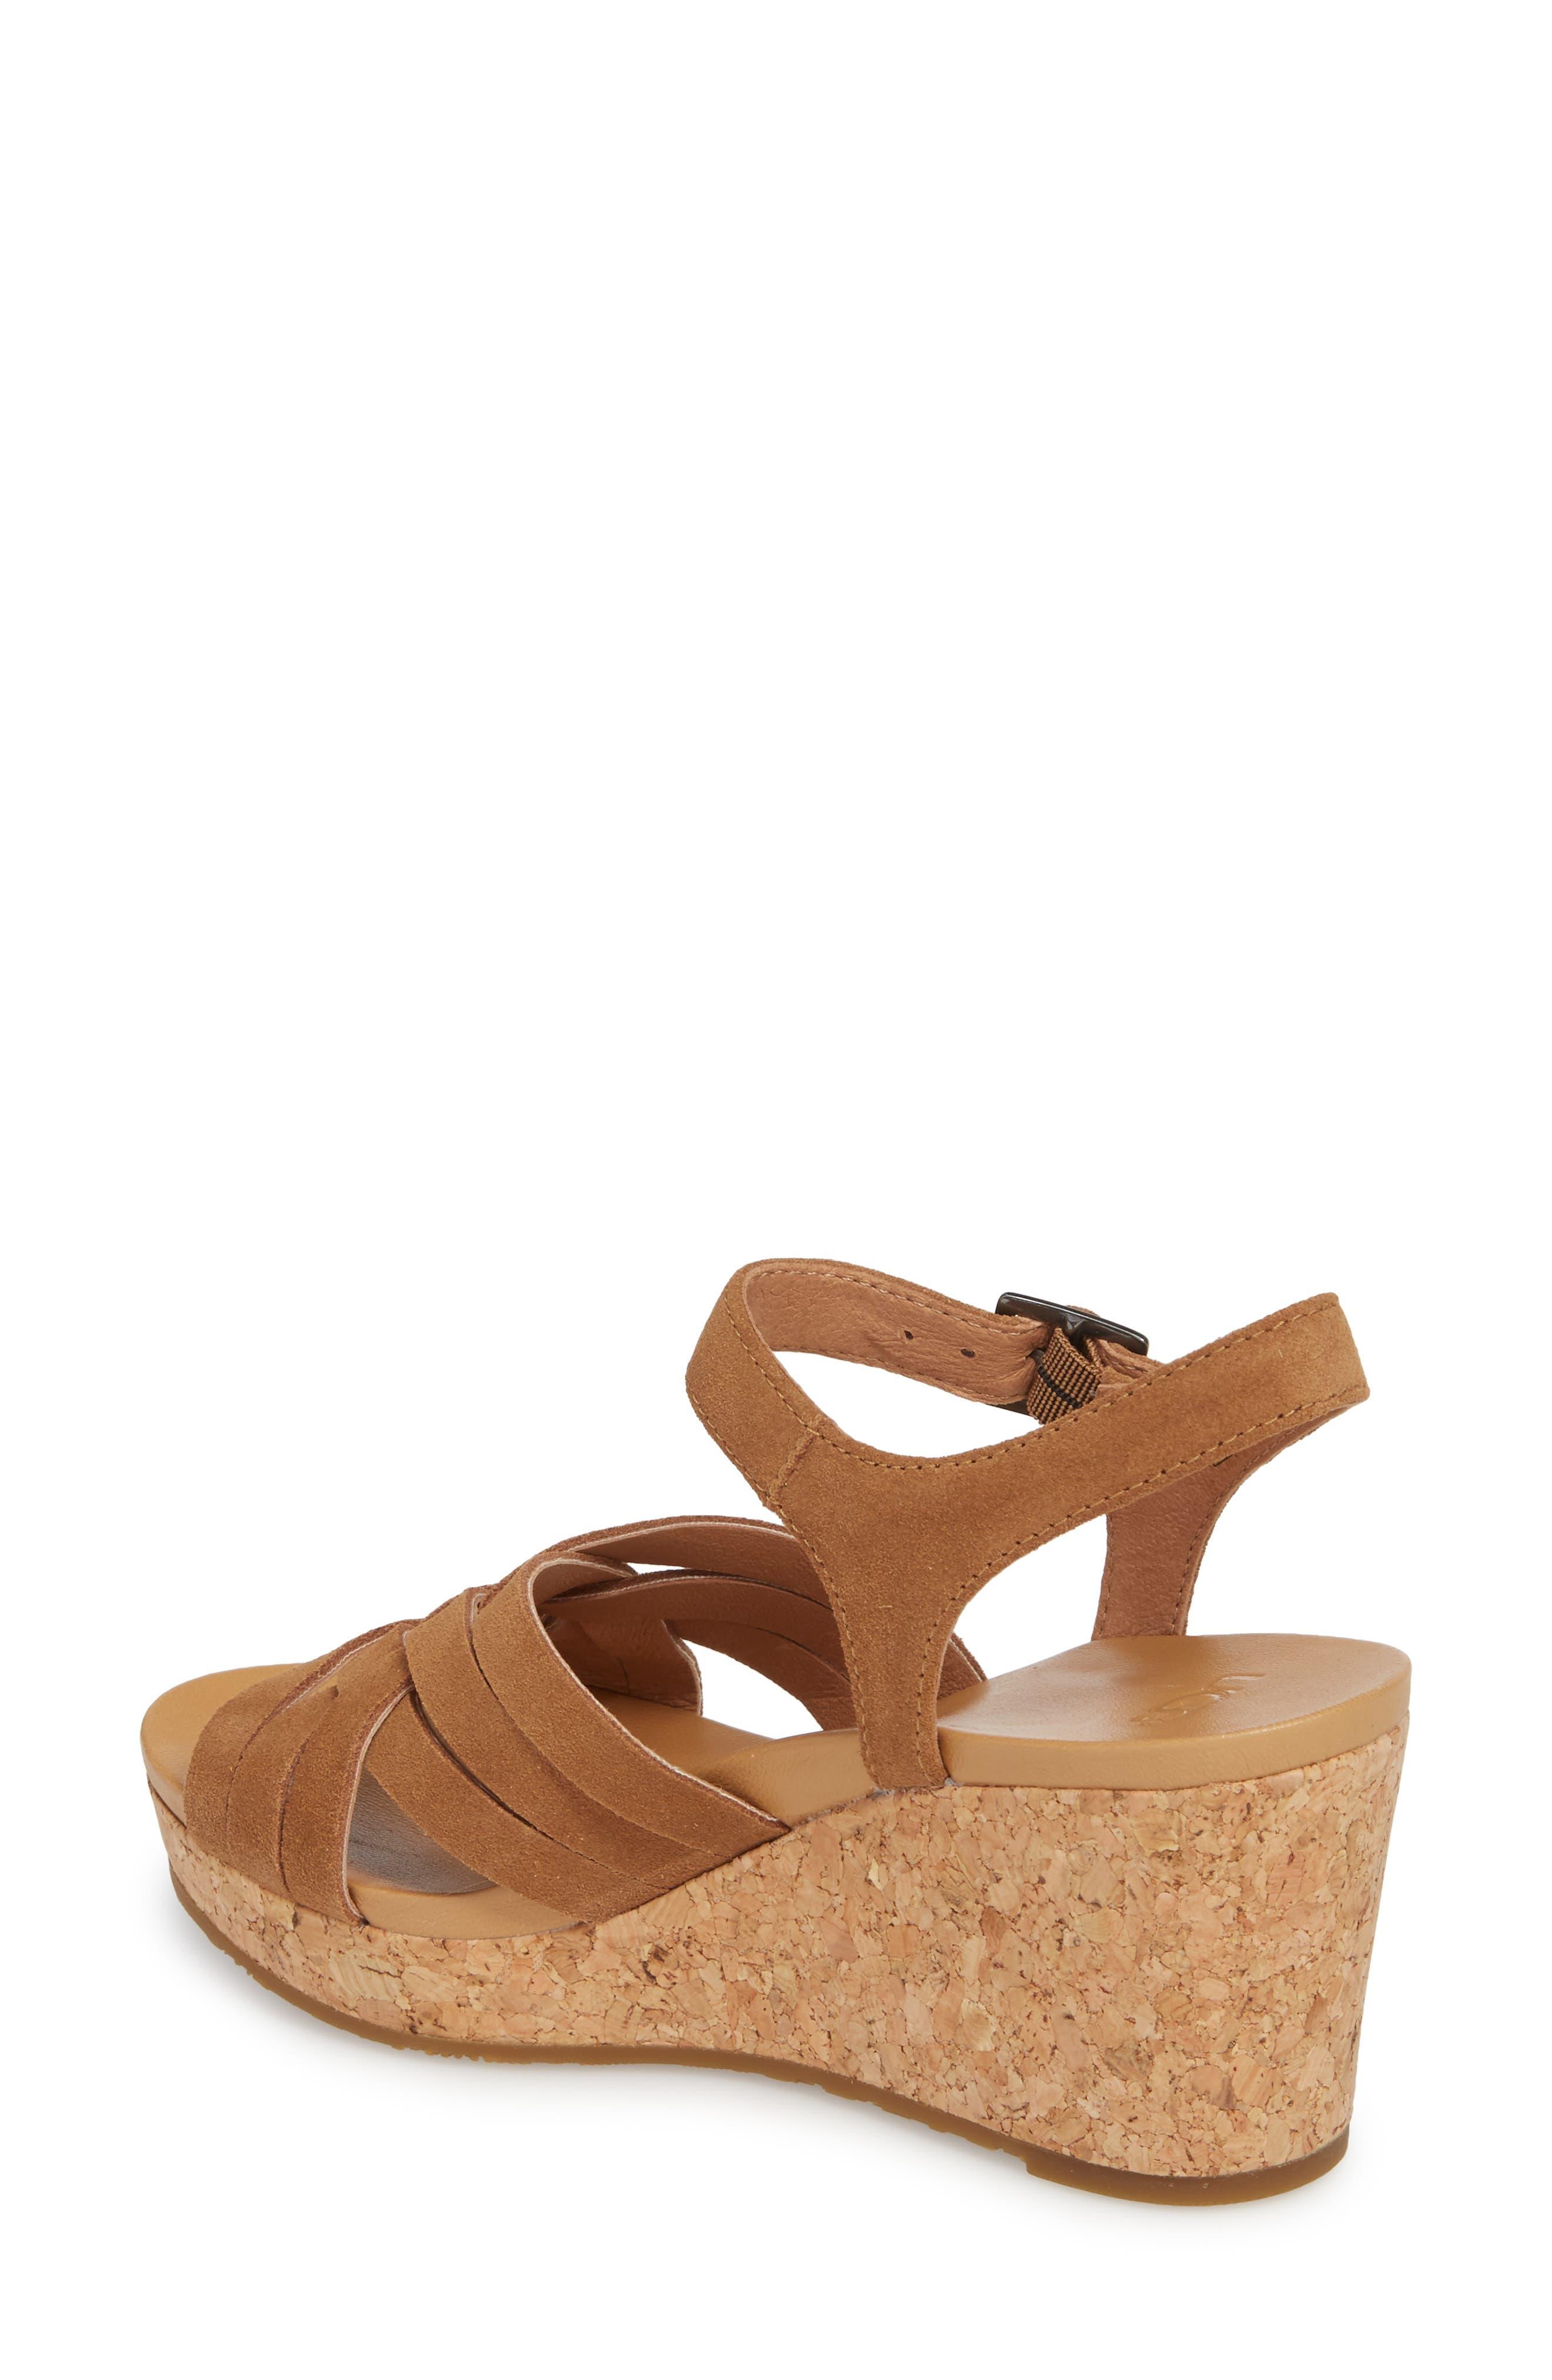 Uma Wedge Sandal,                             Alternate thumbnail 2, color,                             Chestnut Suede